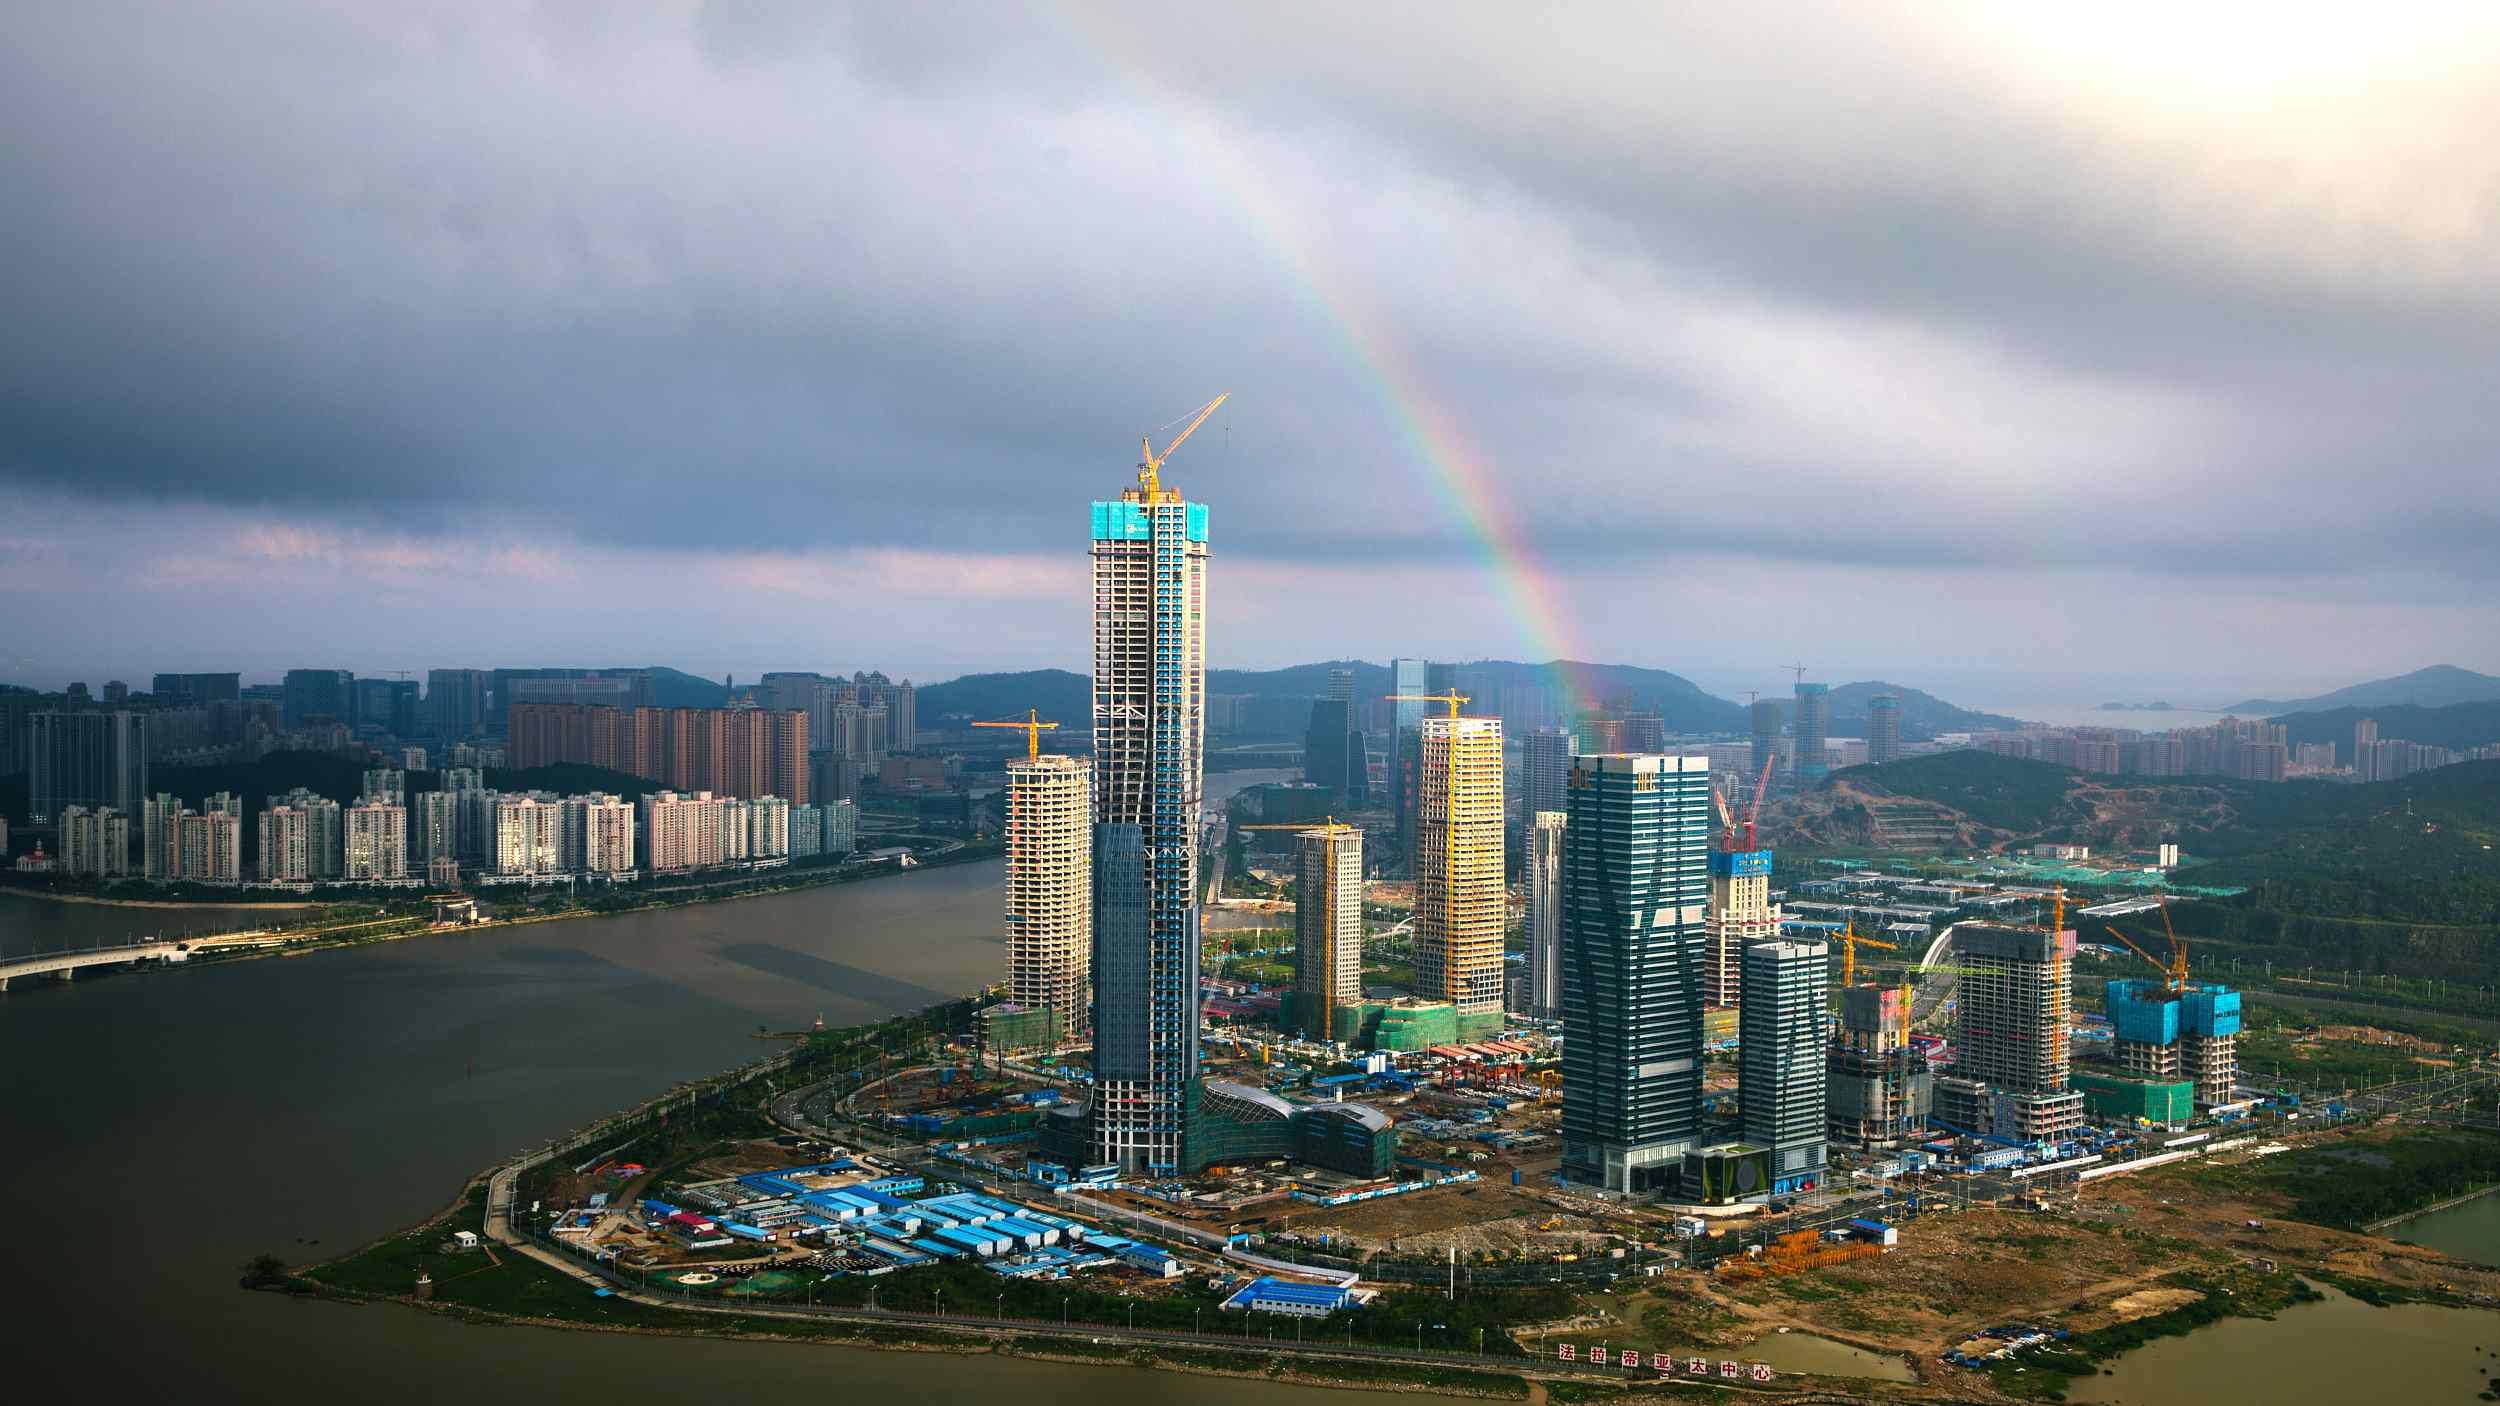 China plans on turning Hengqin into international tourist destination